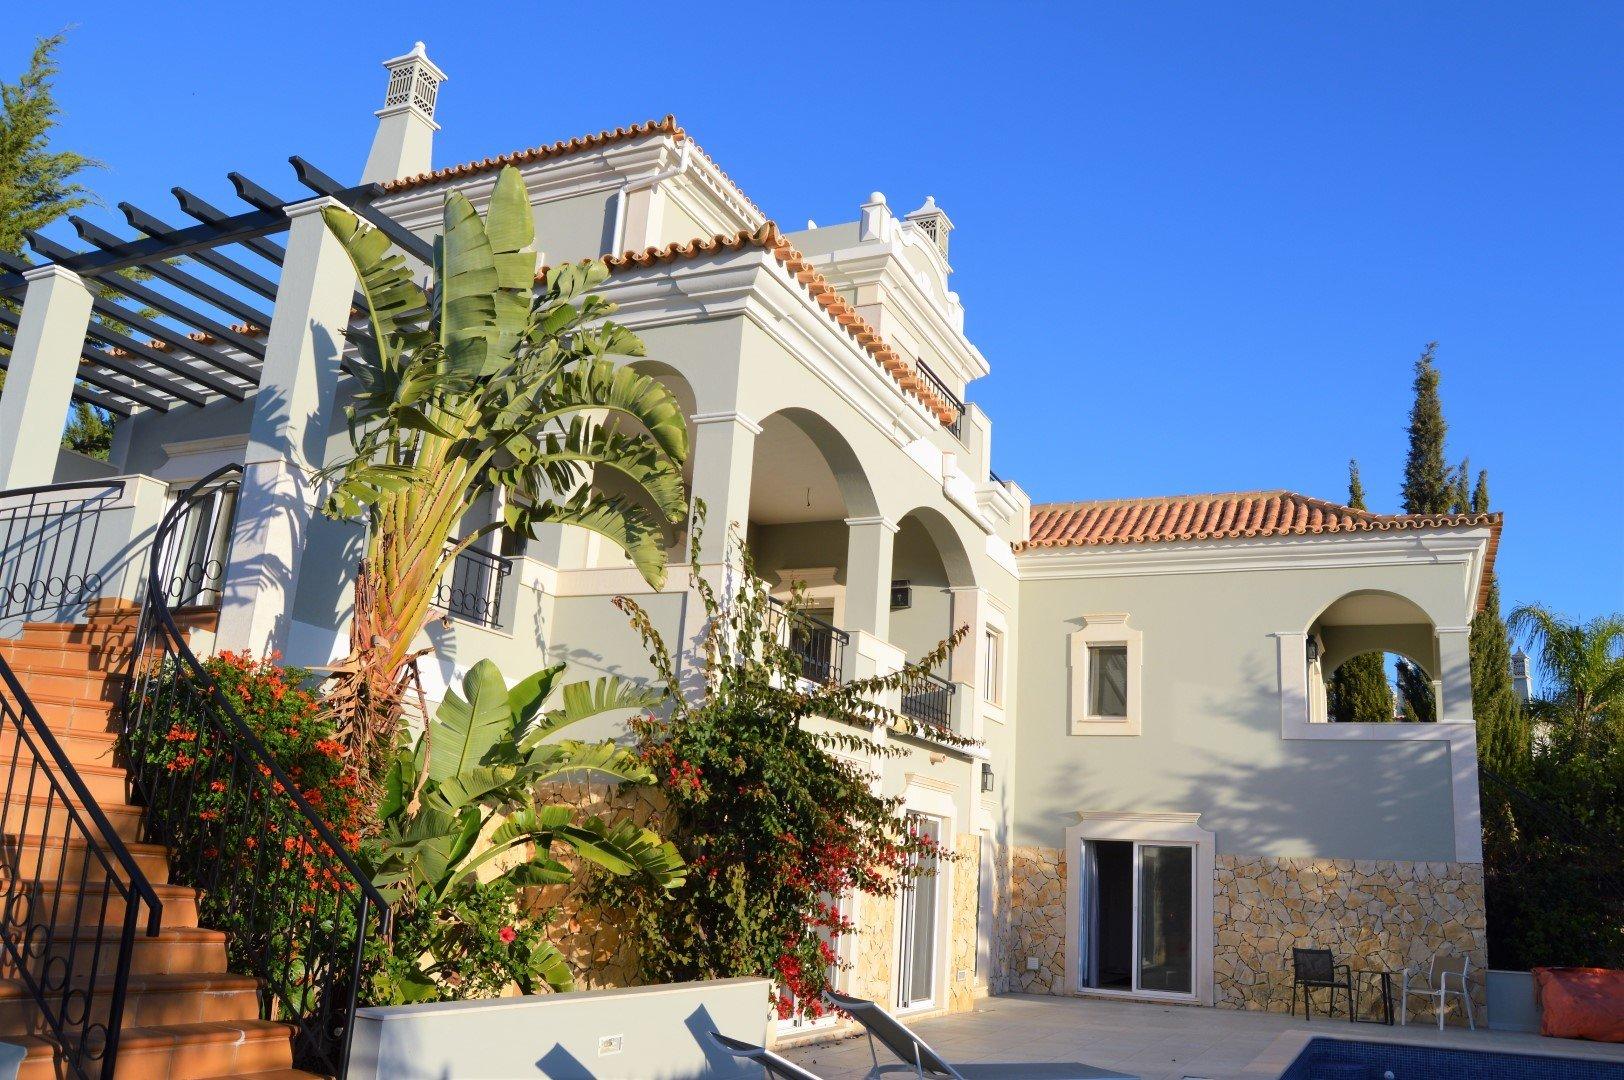 4 Bedroom Villa Almancil, Central Algarve Ref: MV24025